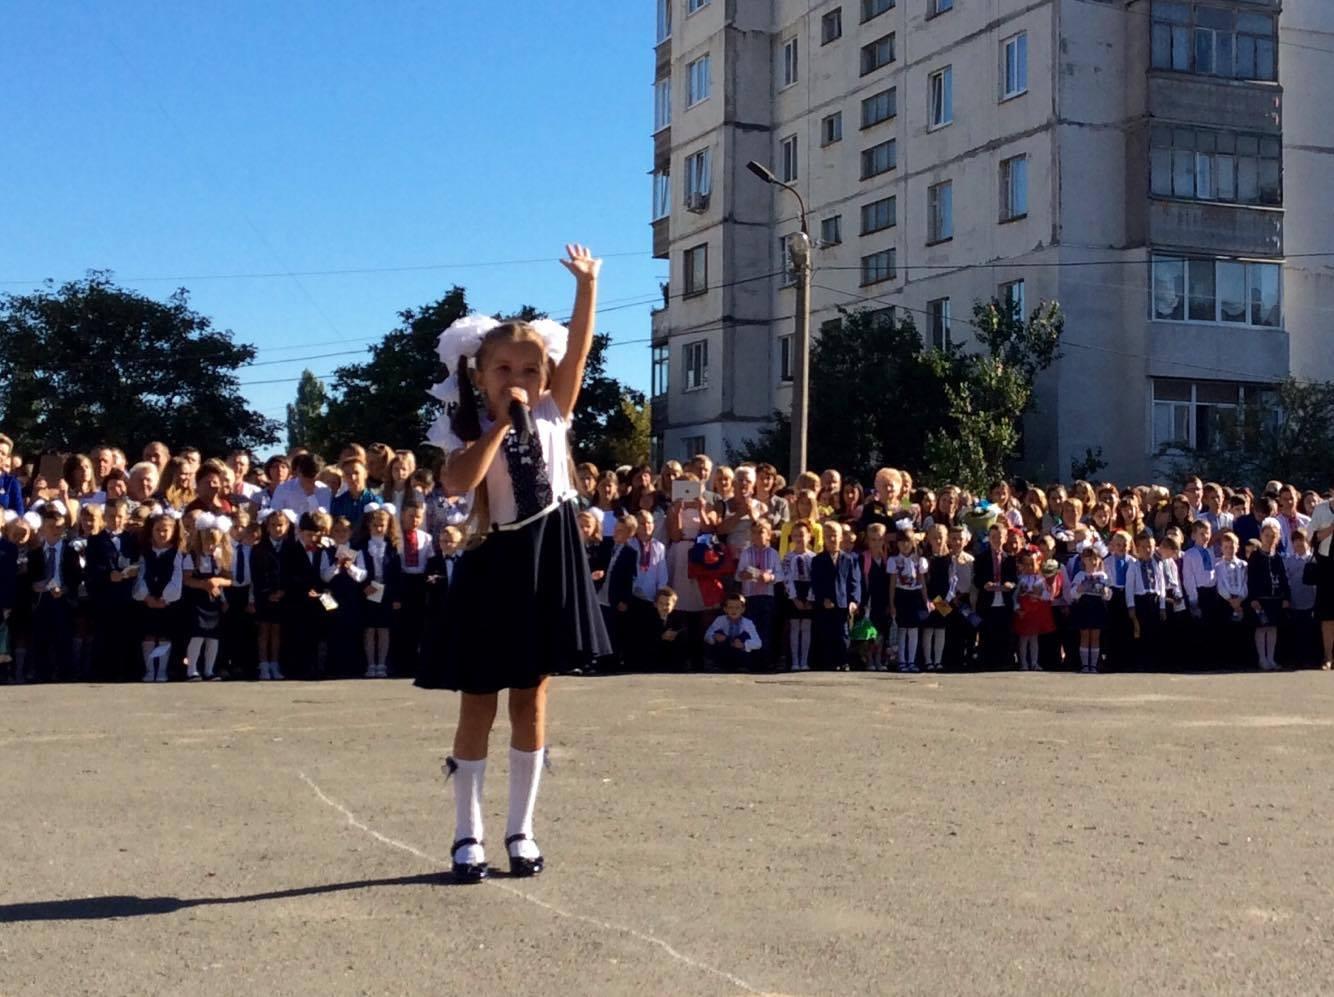 Хмельницький НВК№10 на Першовересень заполонили поліцейські - фото 6